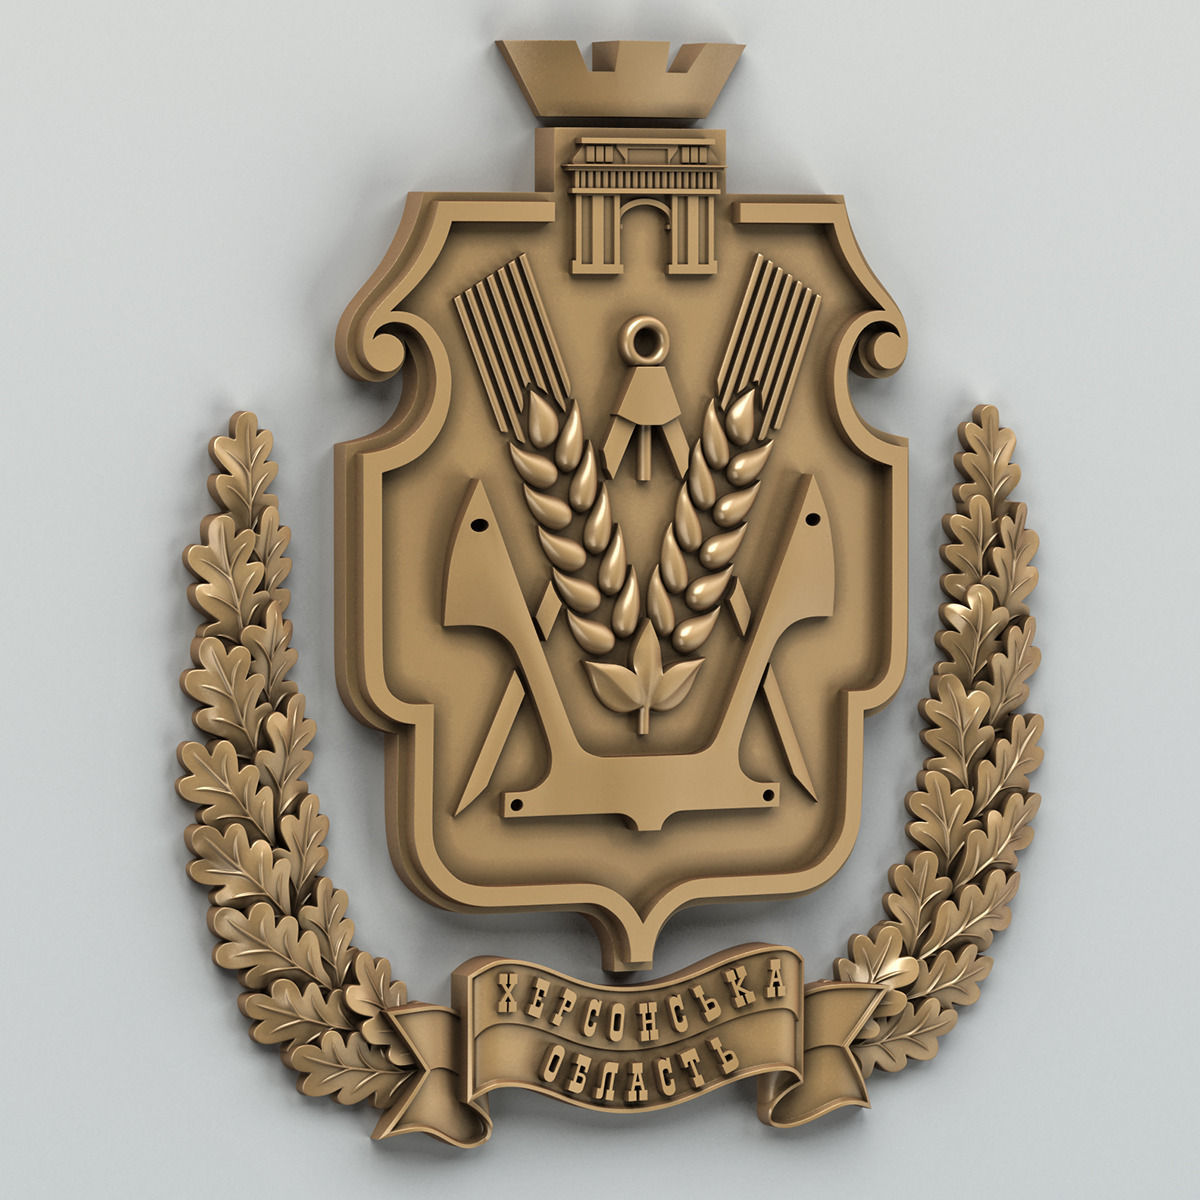 Coat of arms of Kherson region Ukraine